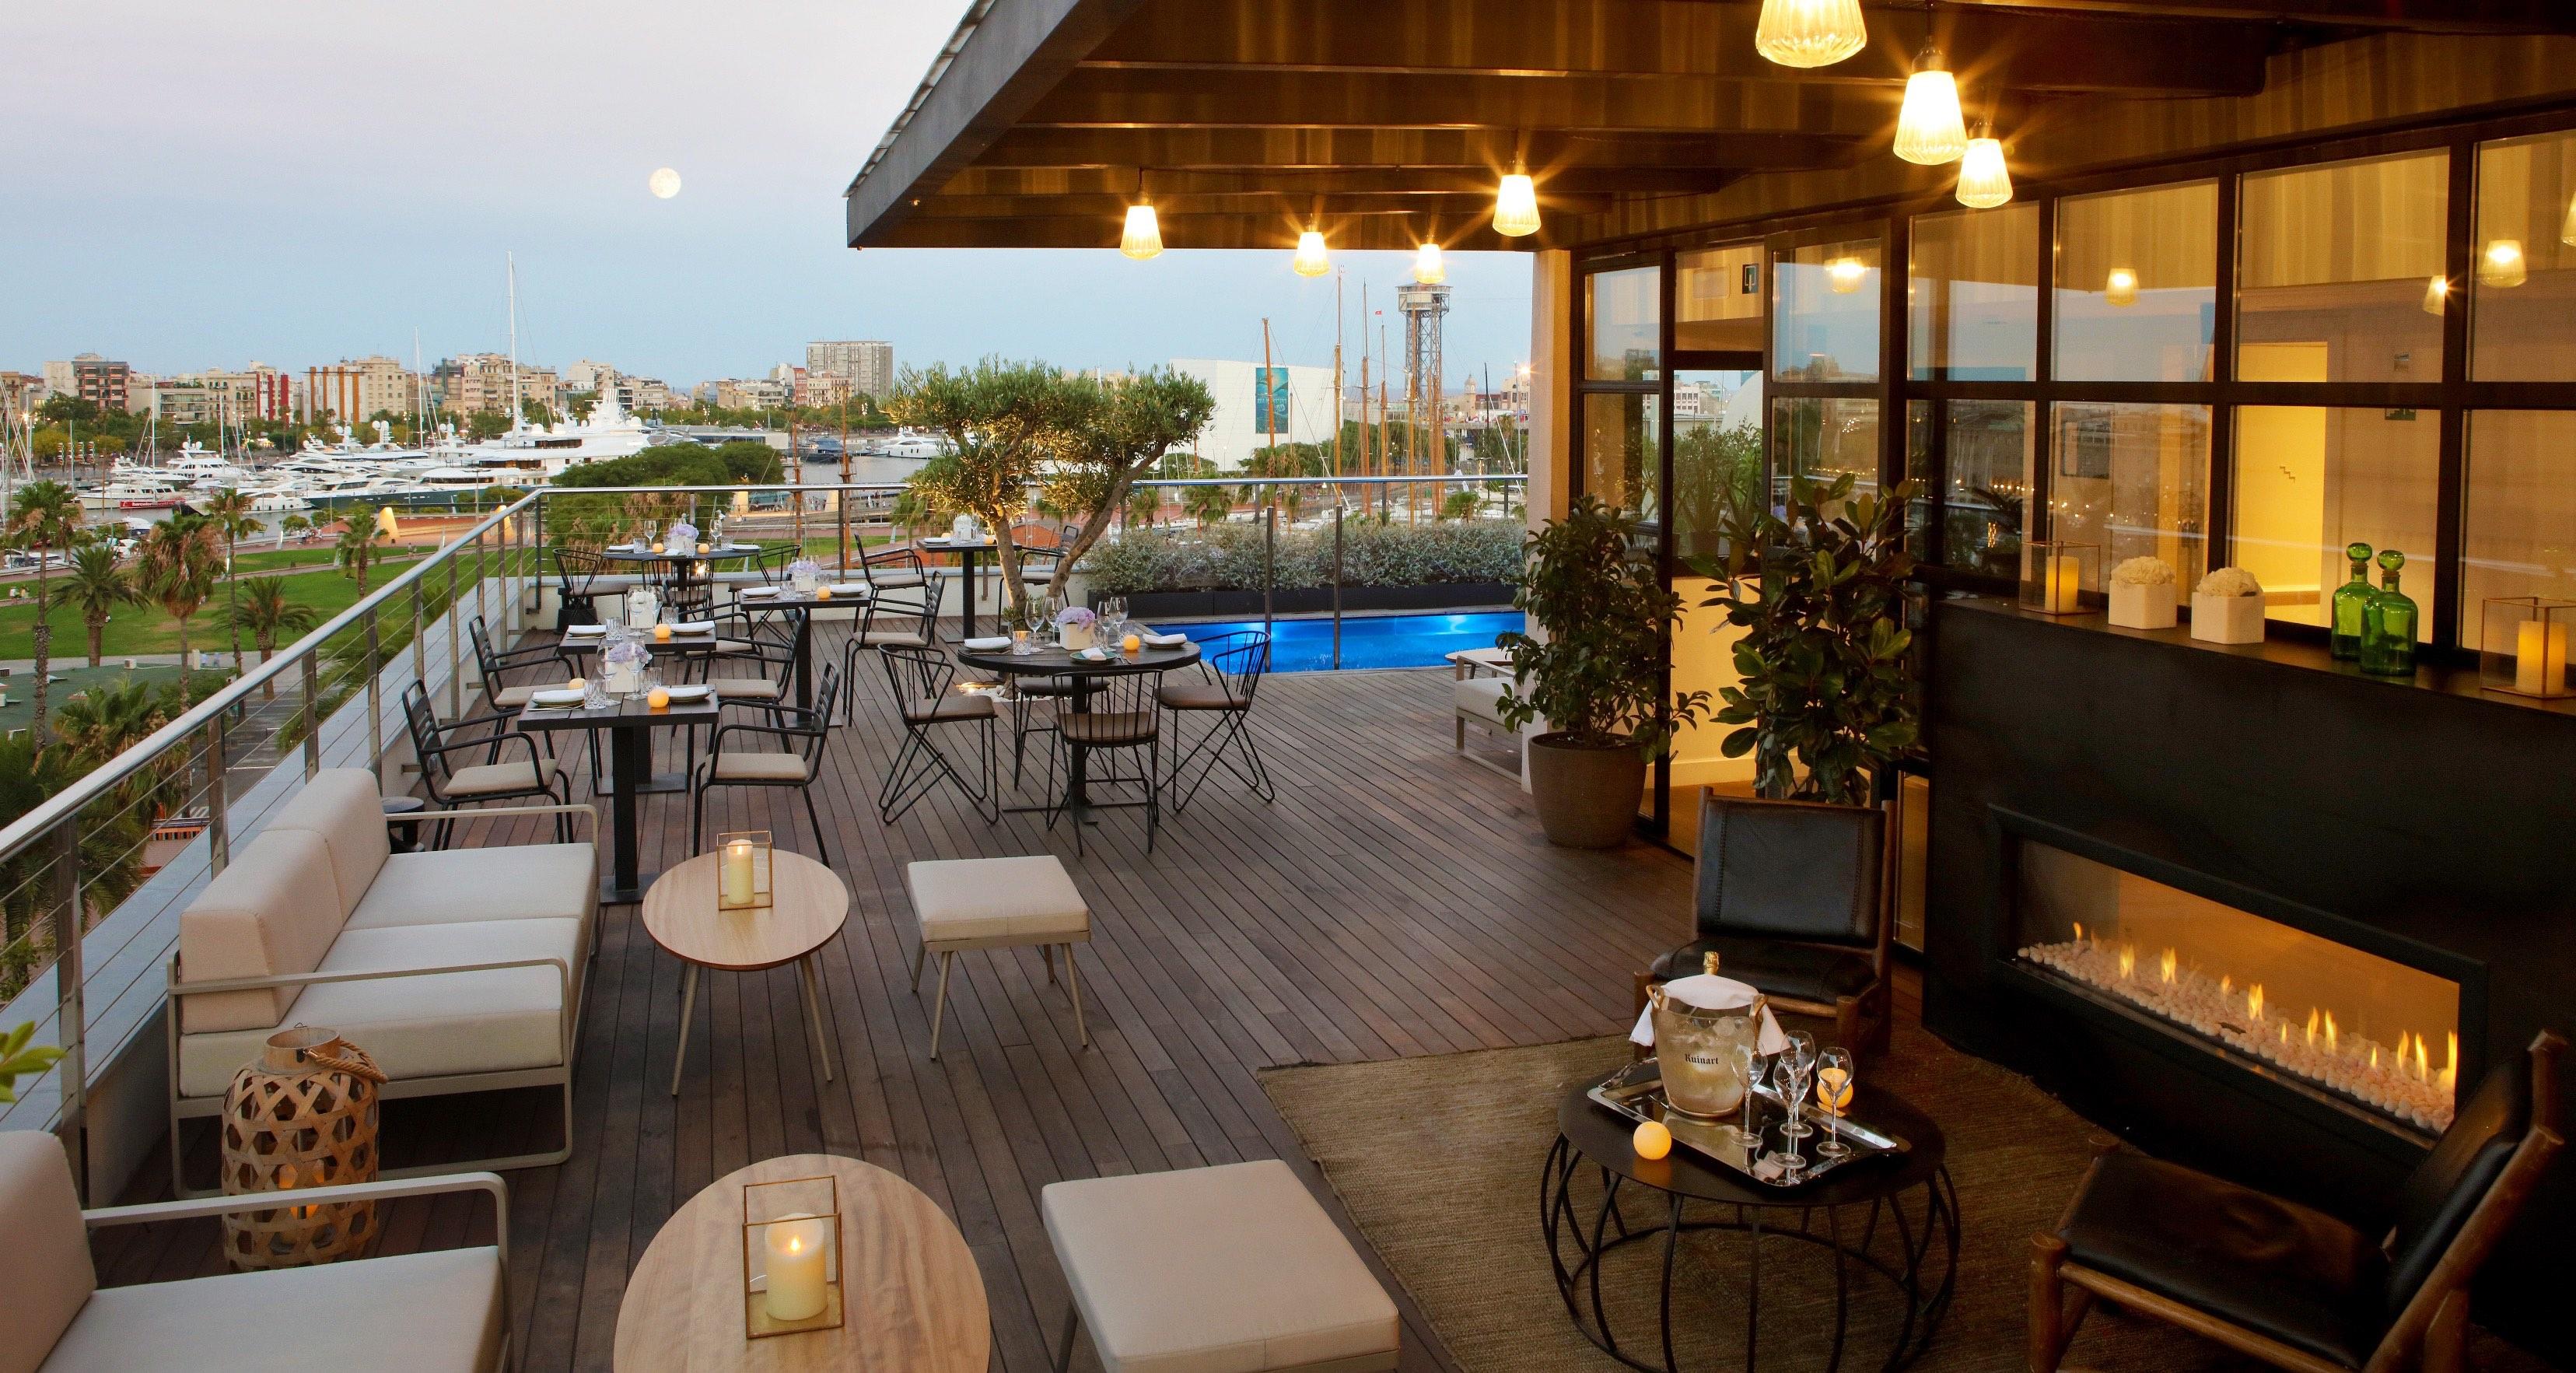 bivaq outdoor furniture mueble exterior terrace garden barcelona the serras